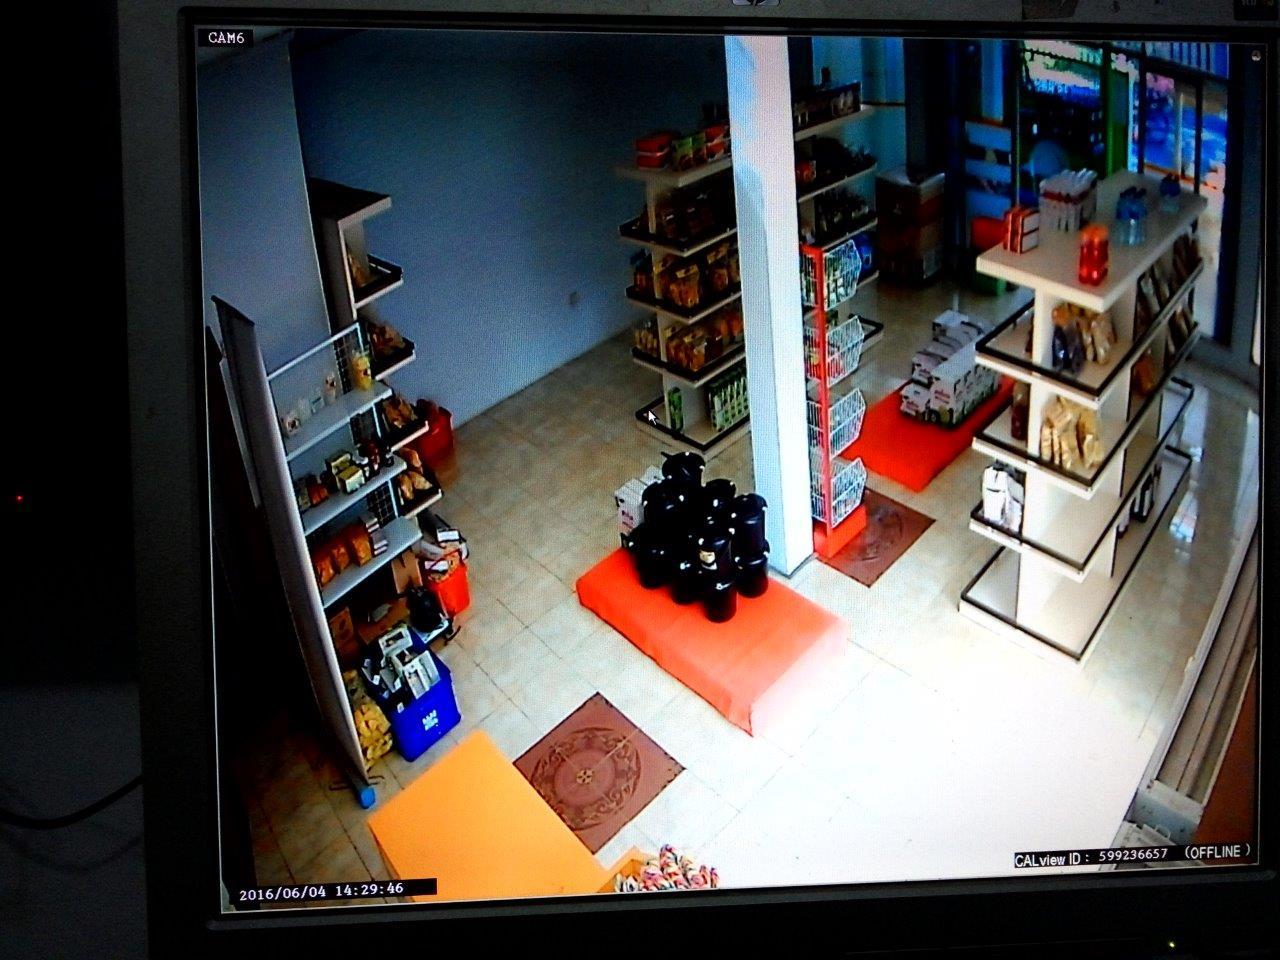 CCTV Cirebon Surveillance System Untuk Retail